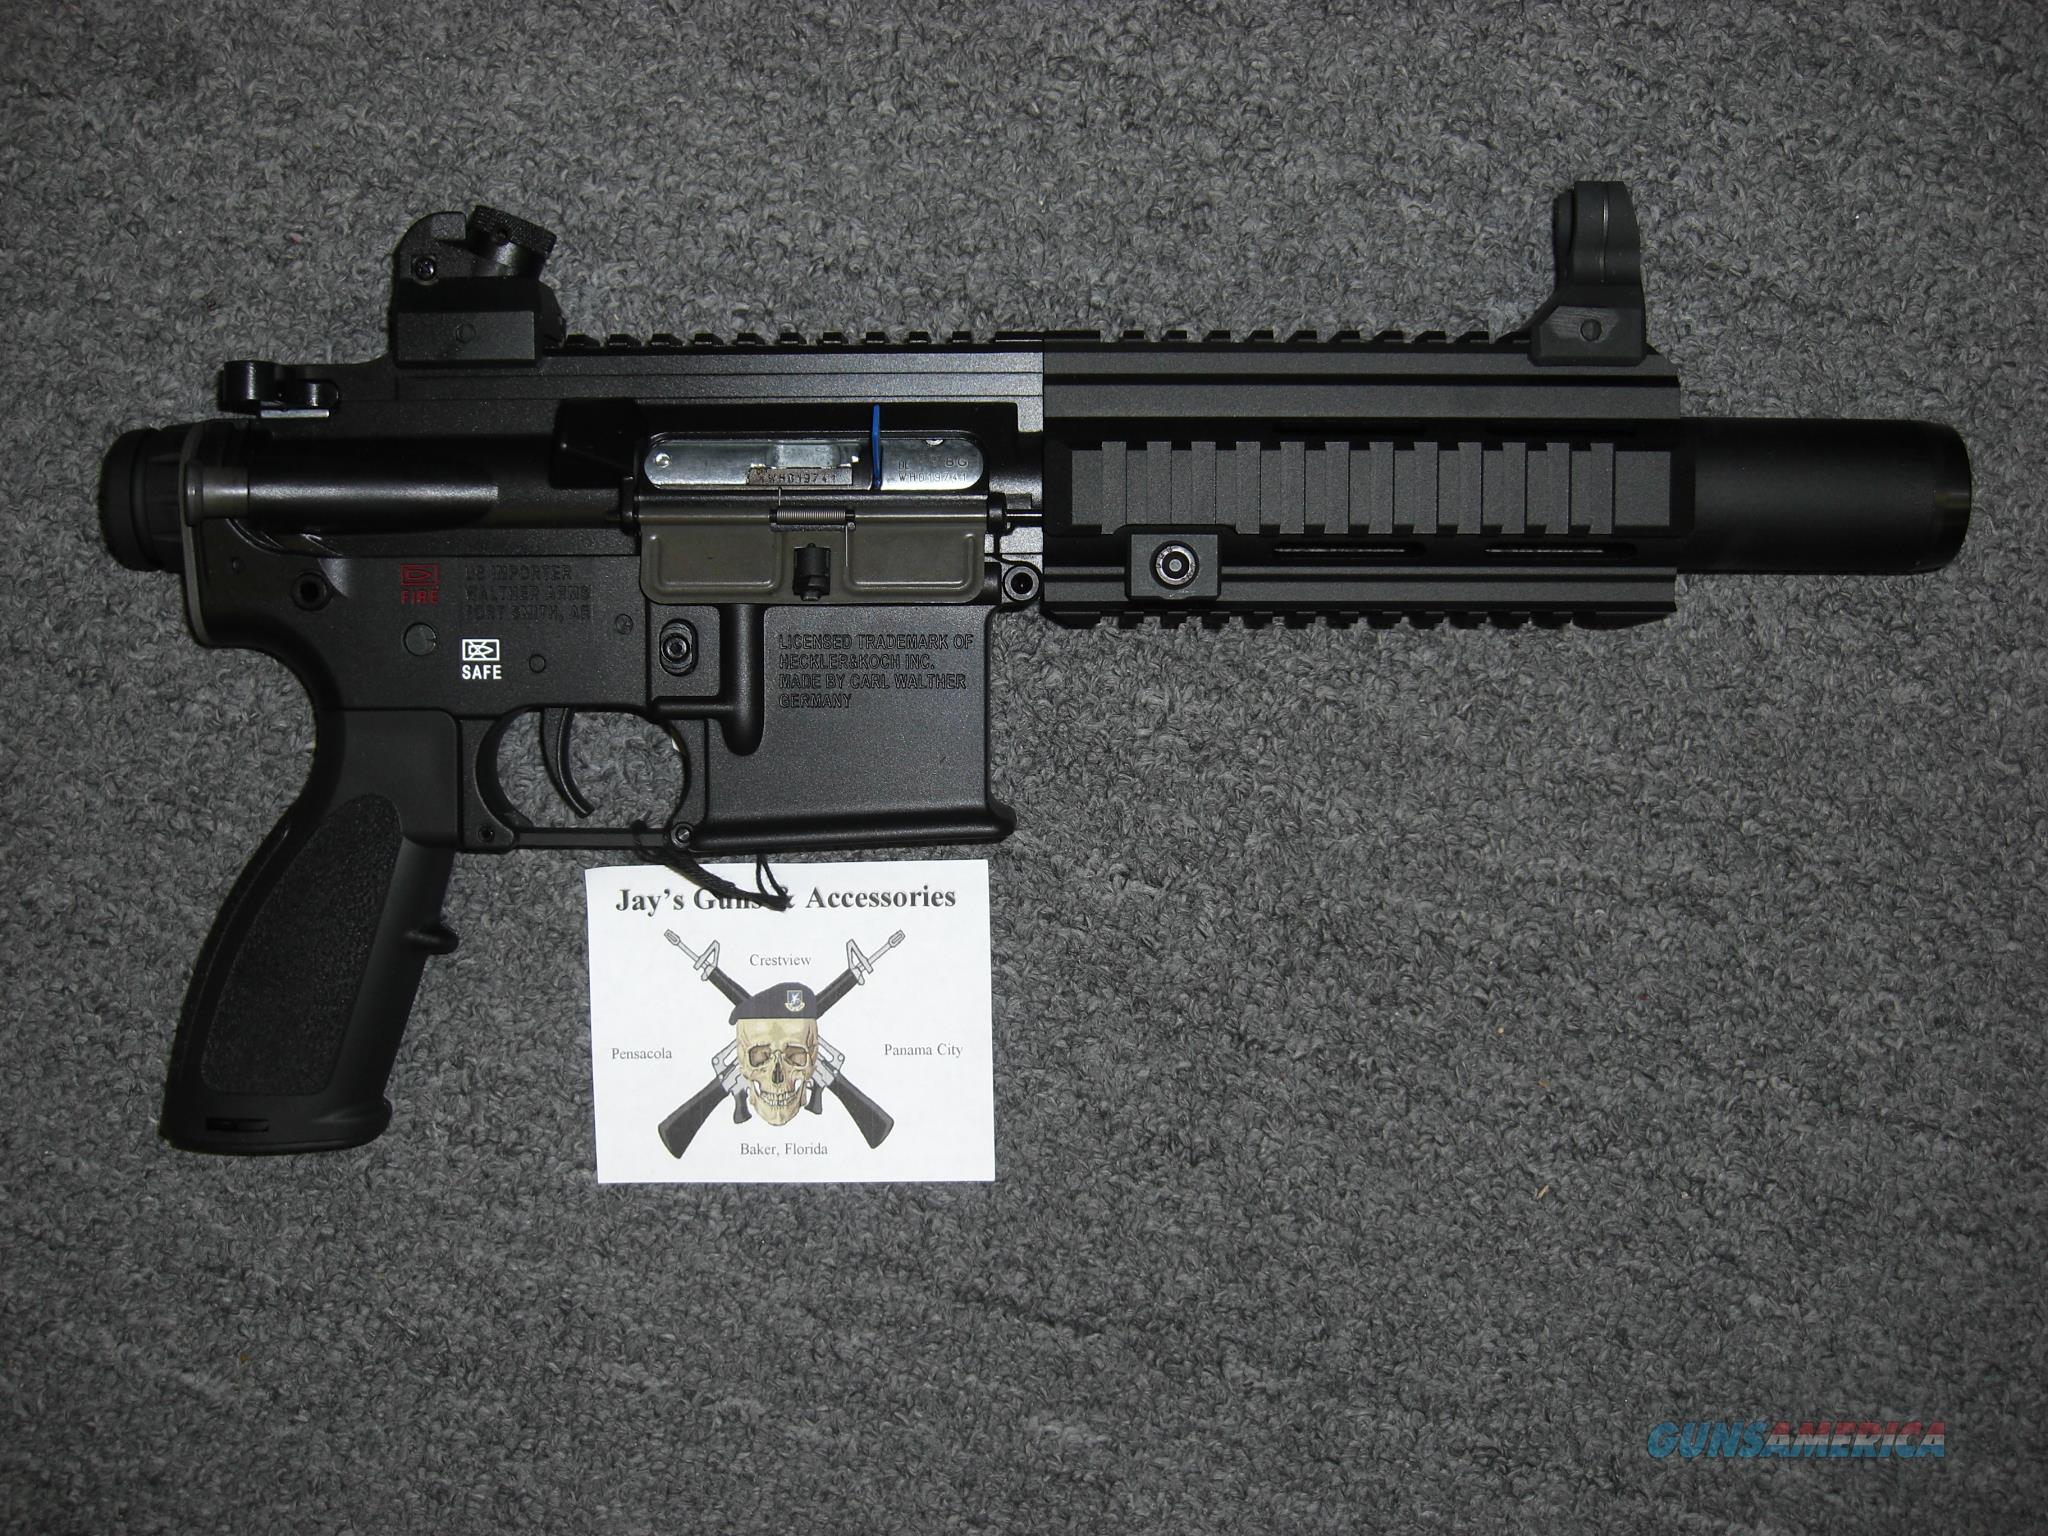 Heckler & Koch HK416 w/Fake Suppressor